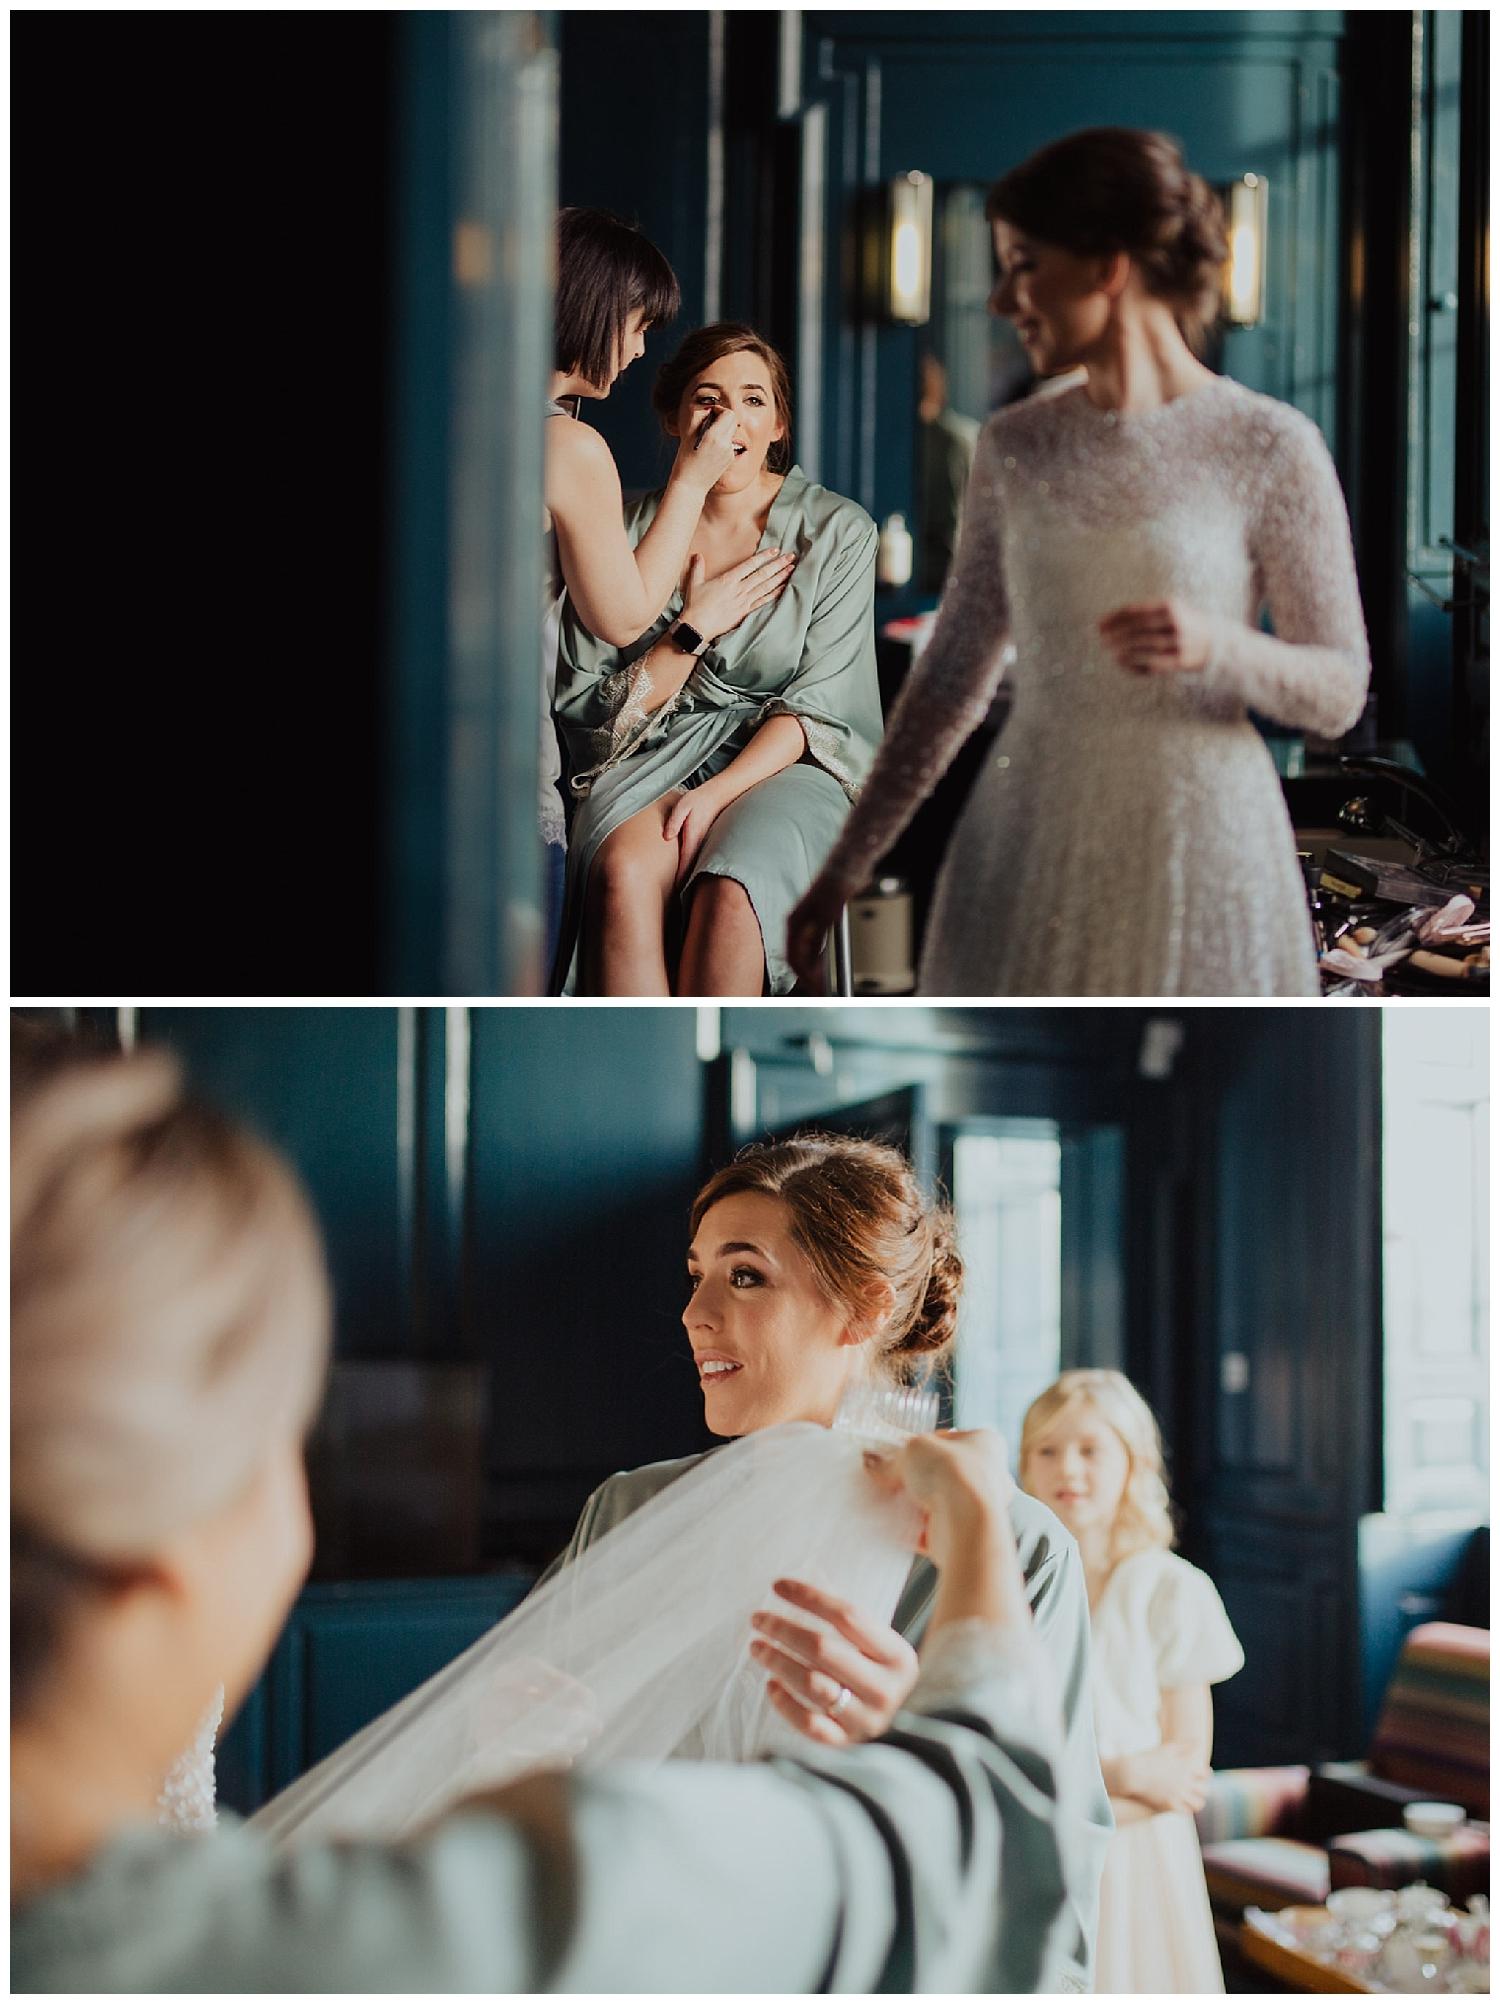 bellinter_house_wedding_livia_figueiredo_56.jpg